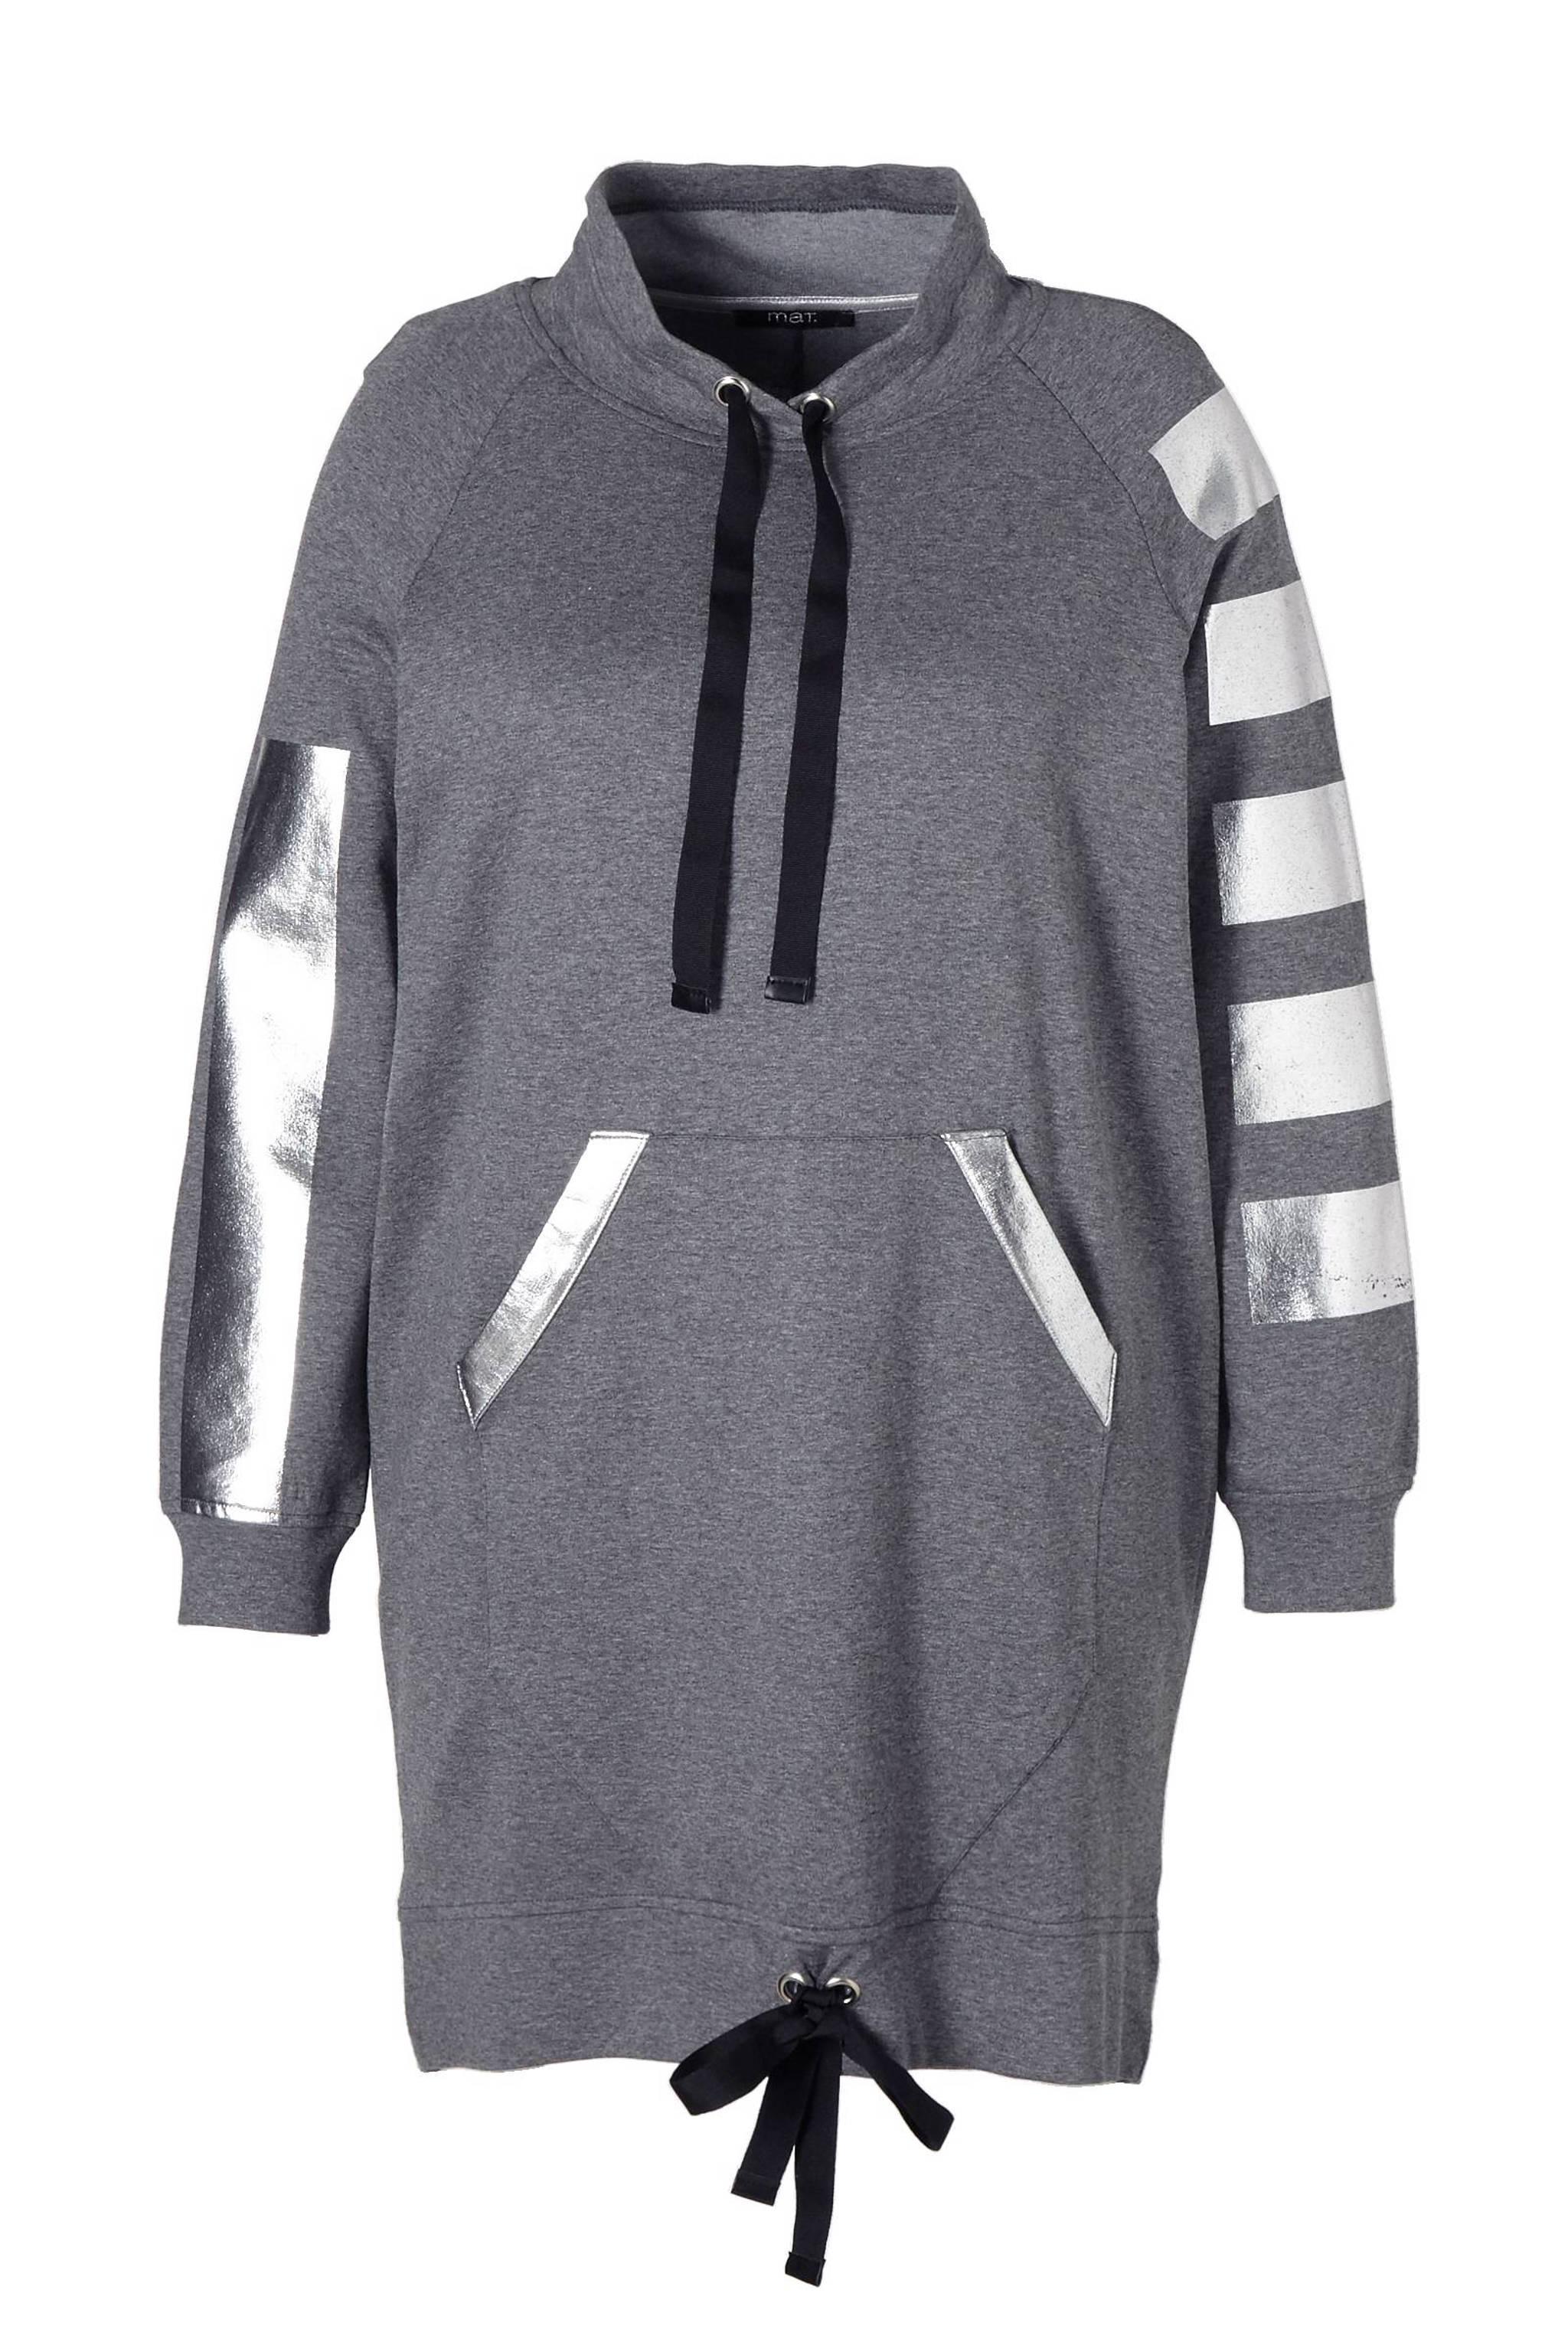 Sweat Trui Dames.Mat Fashion Sweat Trui Wehkamp